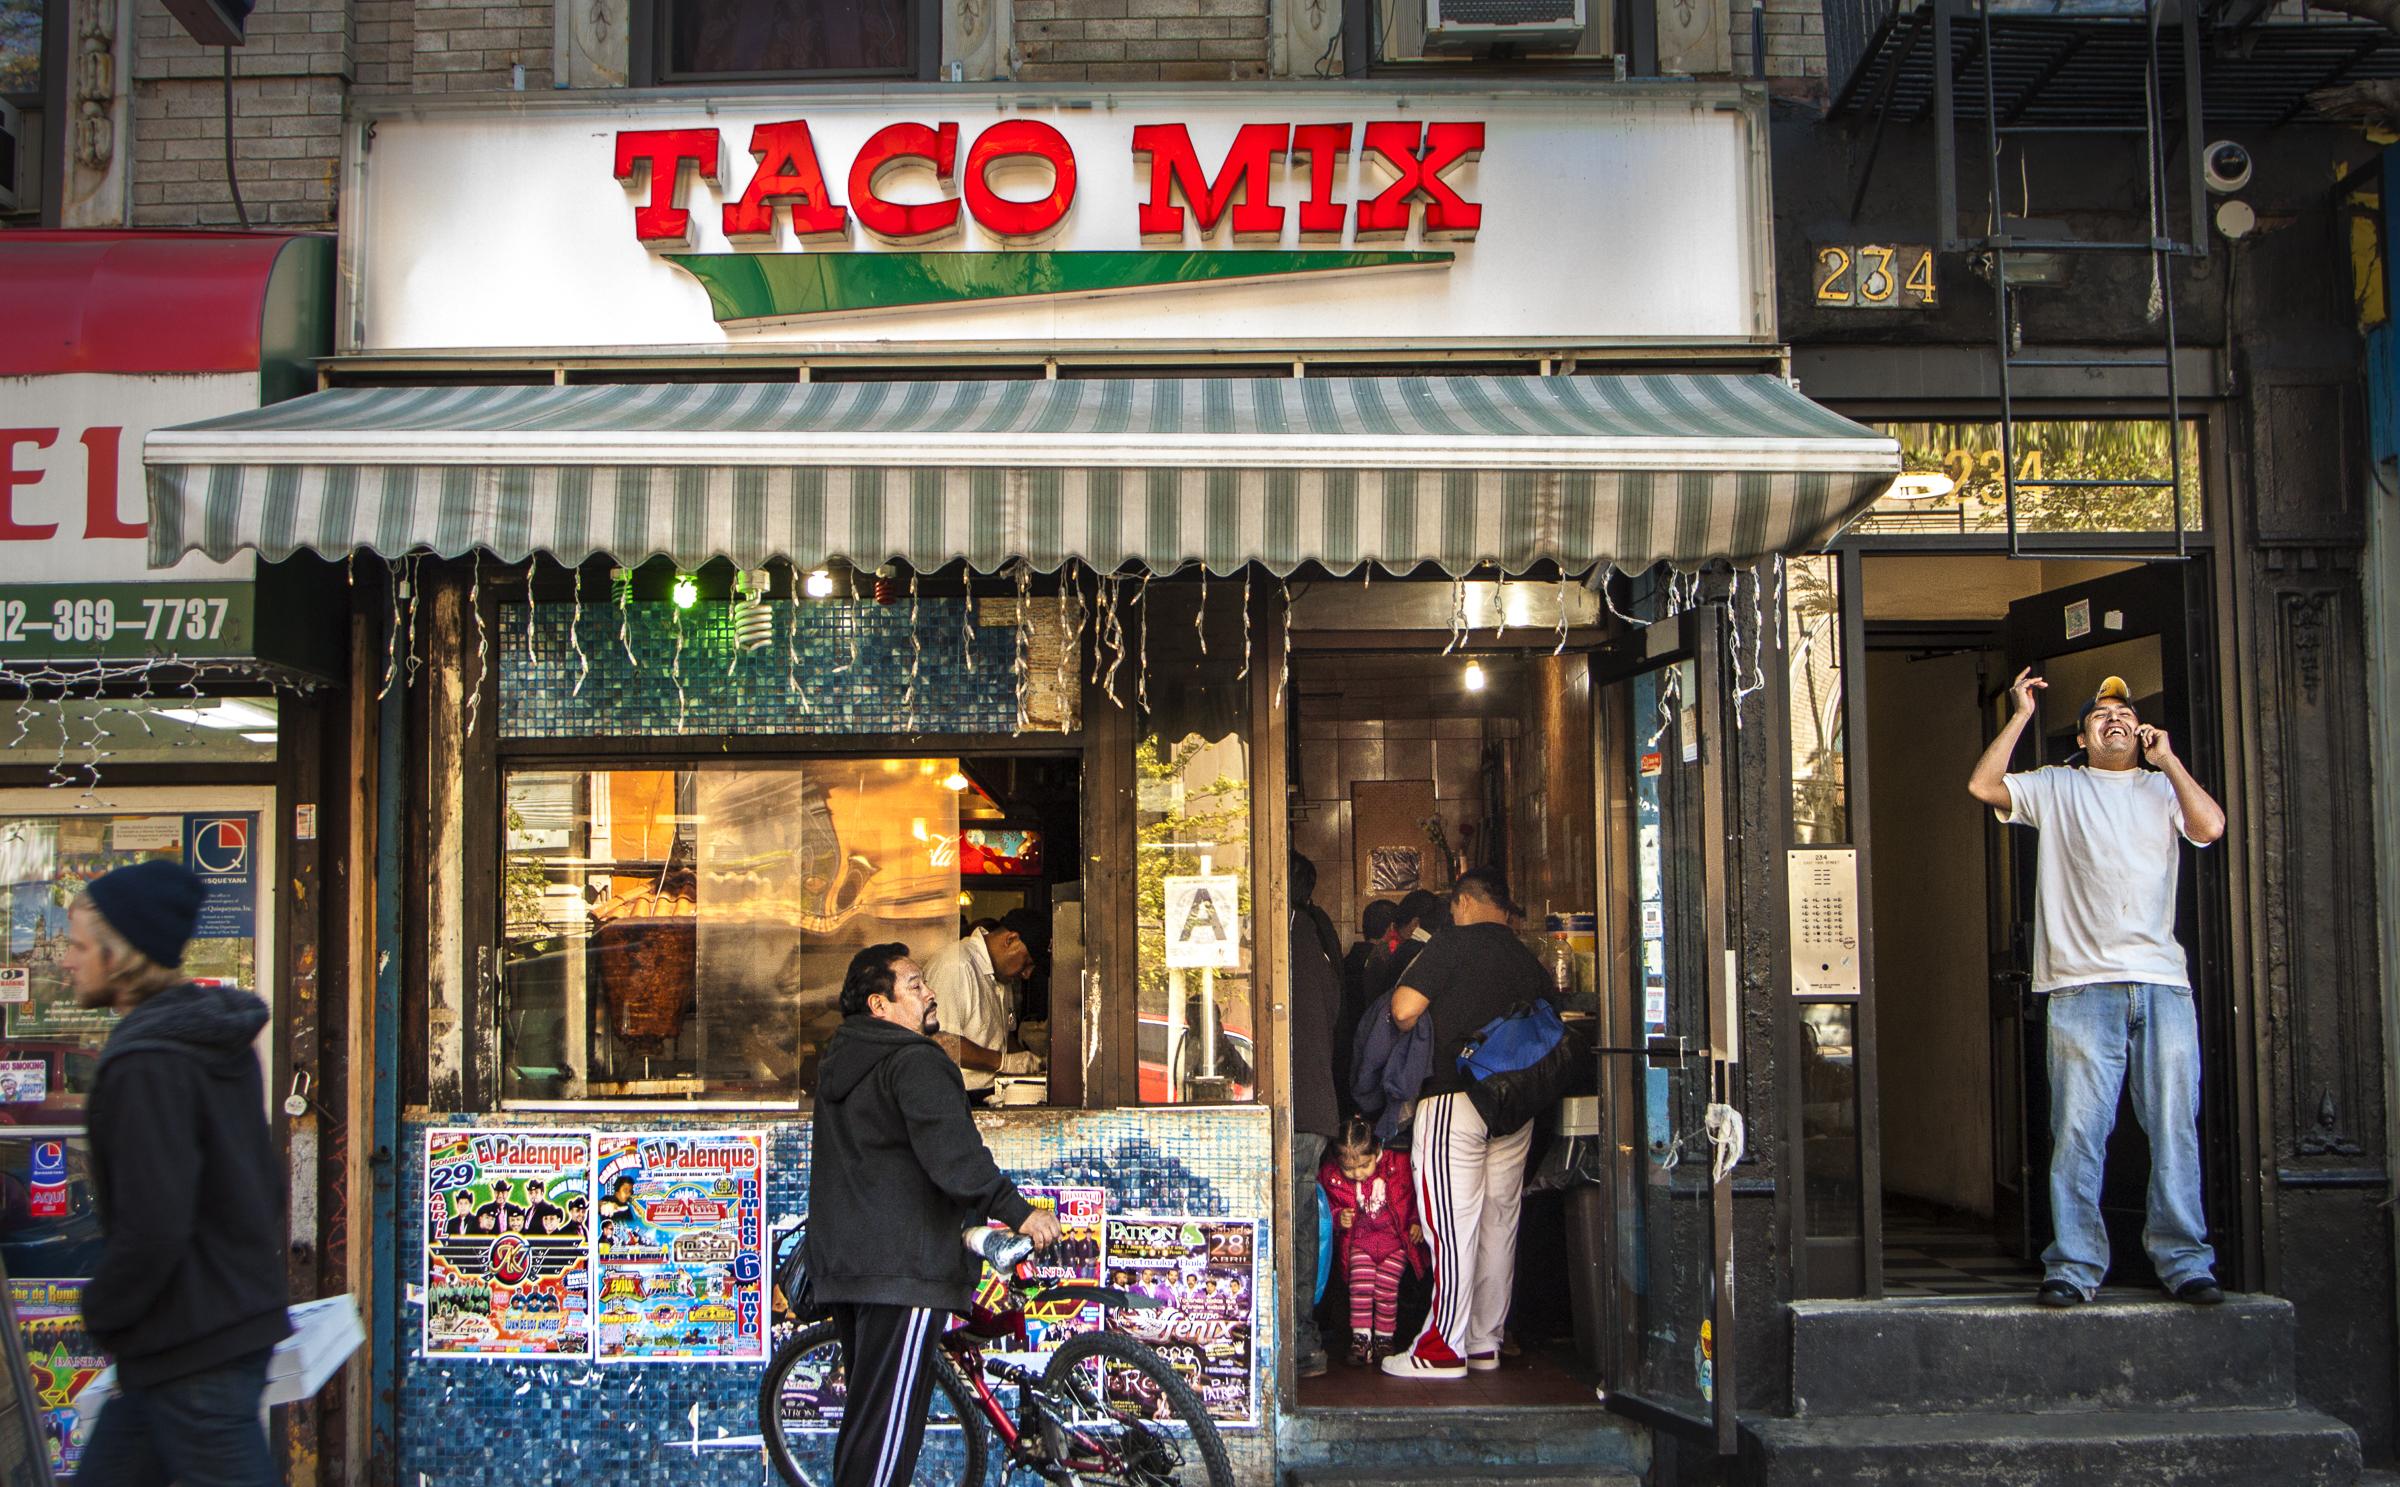 Taco Time. New York, NY 2013 ©  Aldo Sorcia NYC SALT